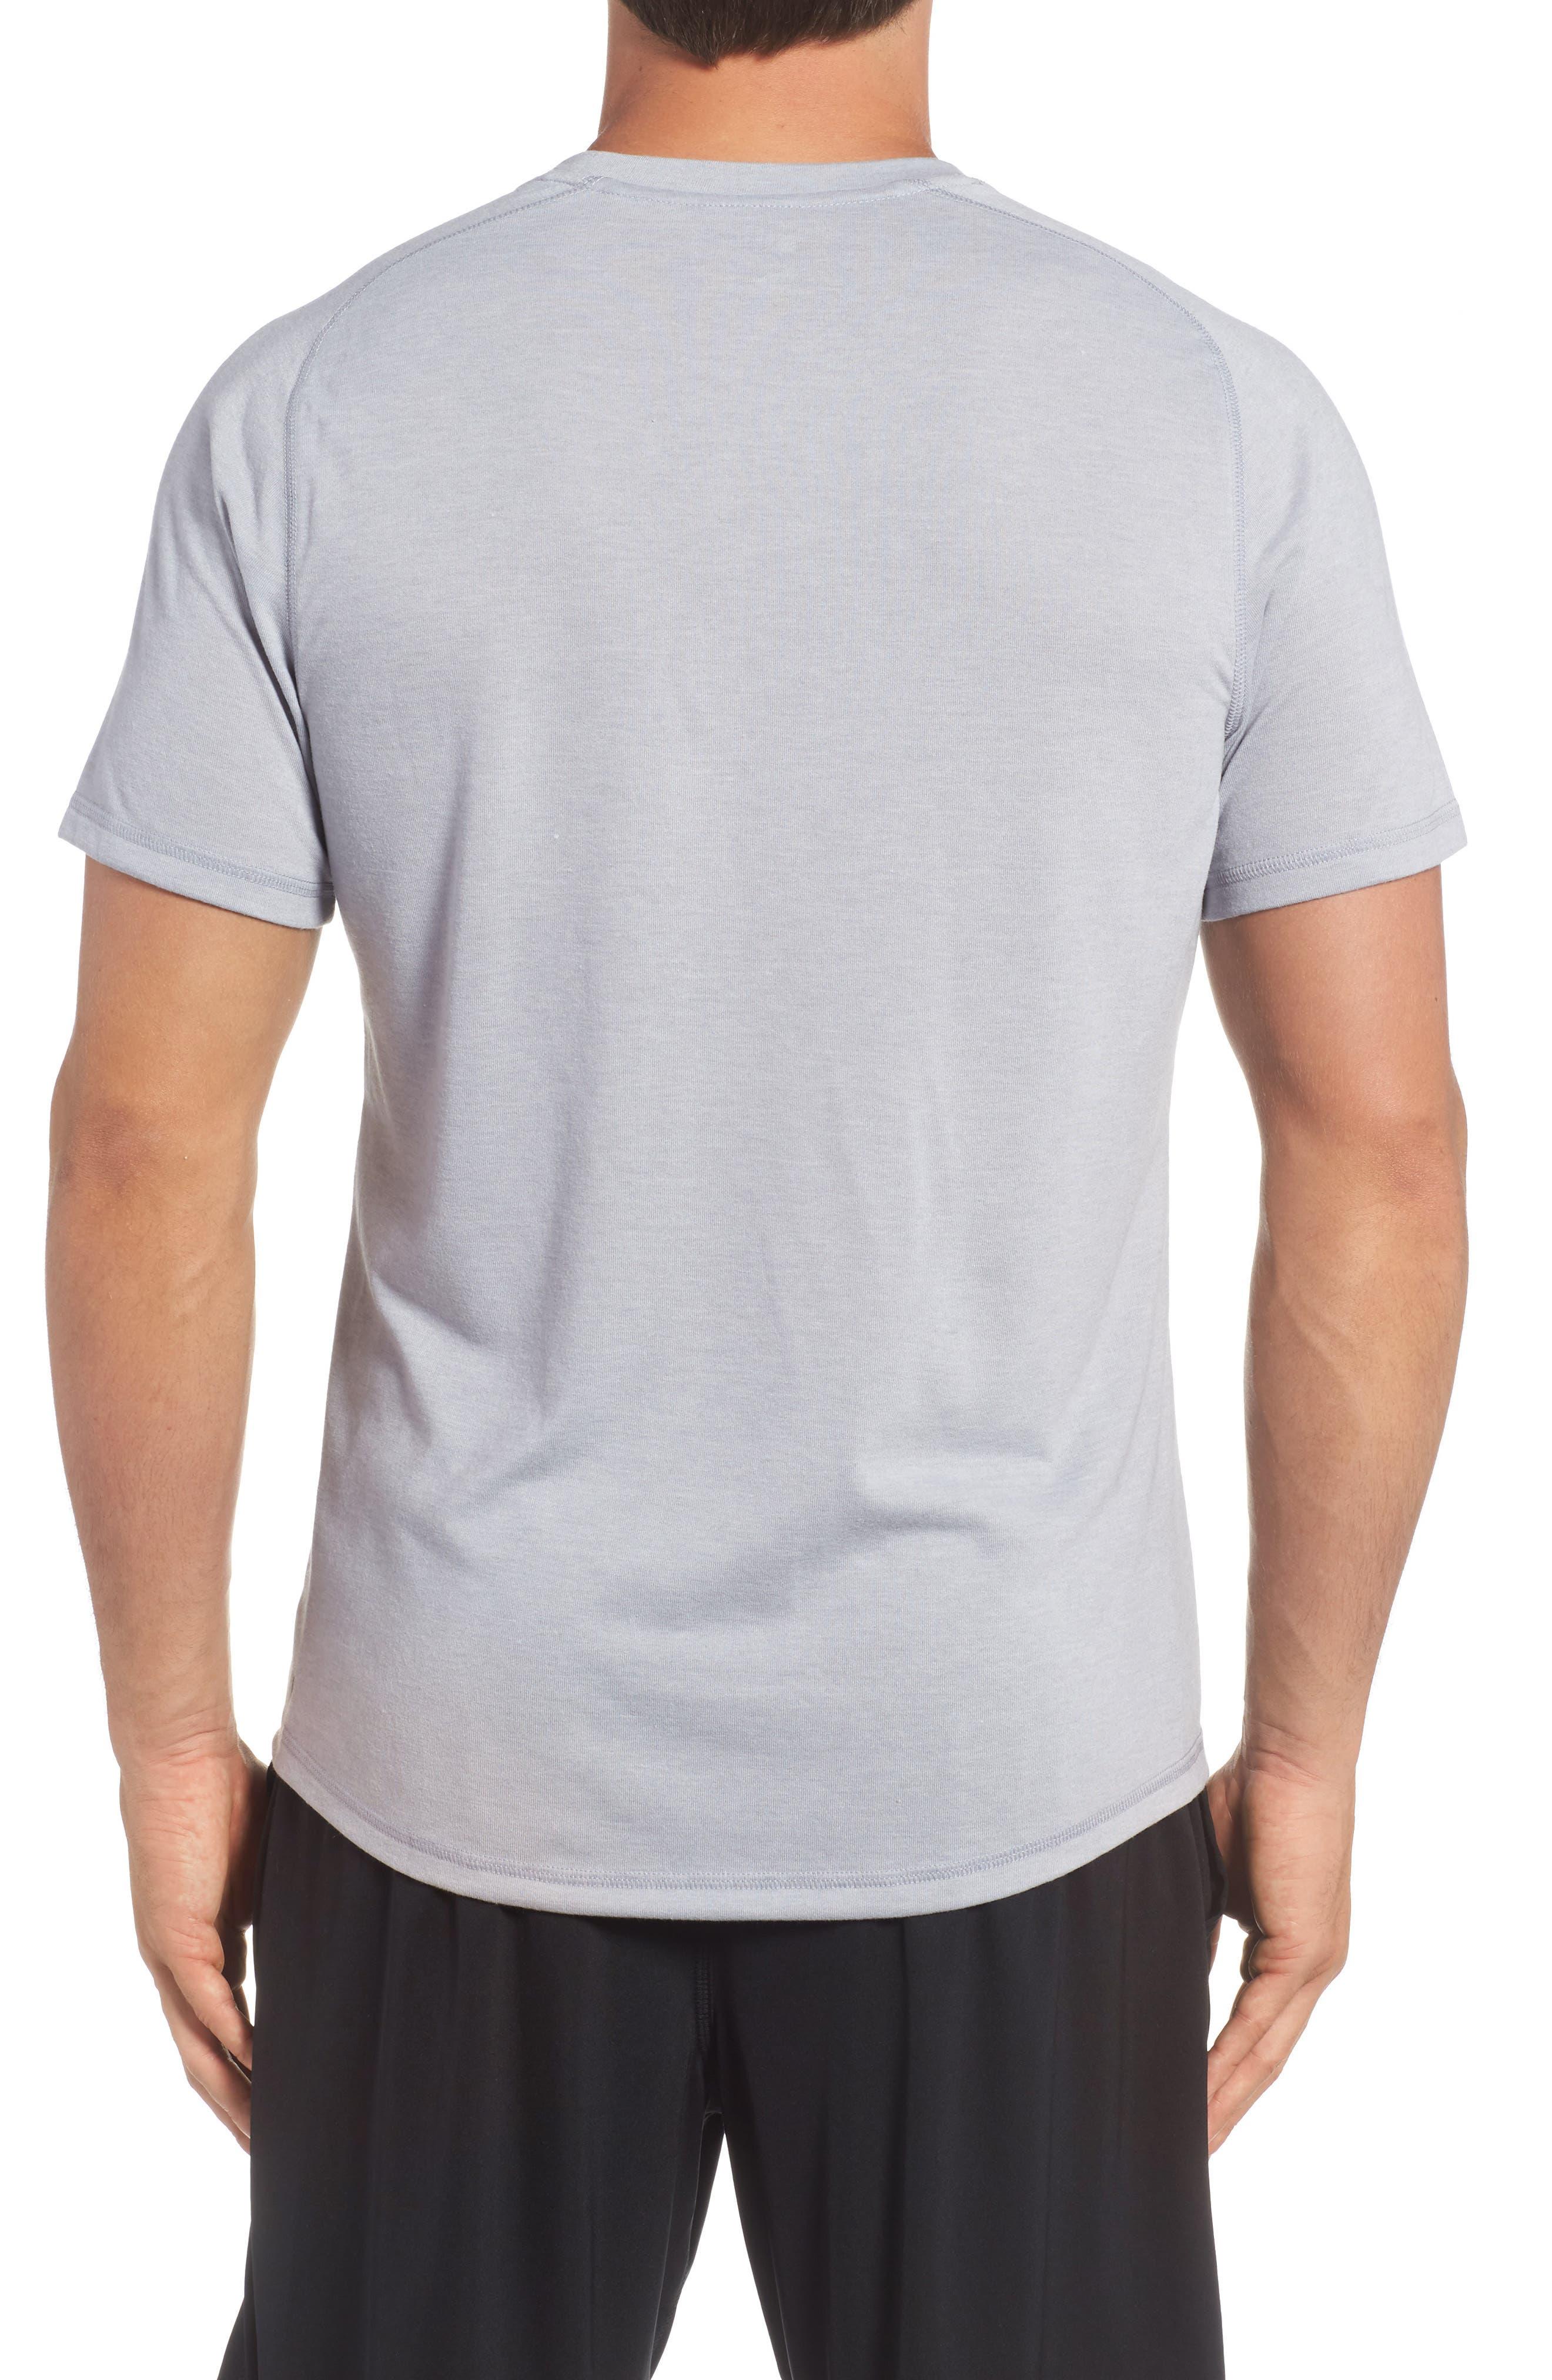 Alternate Image 2  - Zella Celsian Training T-Shirt